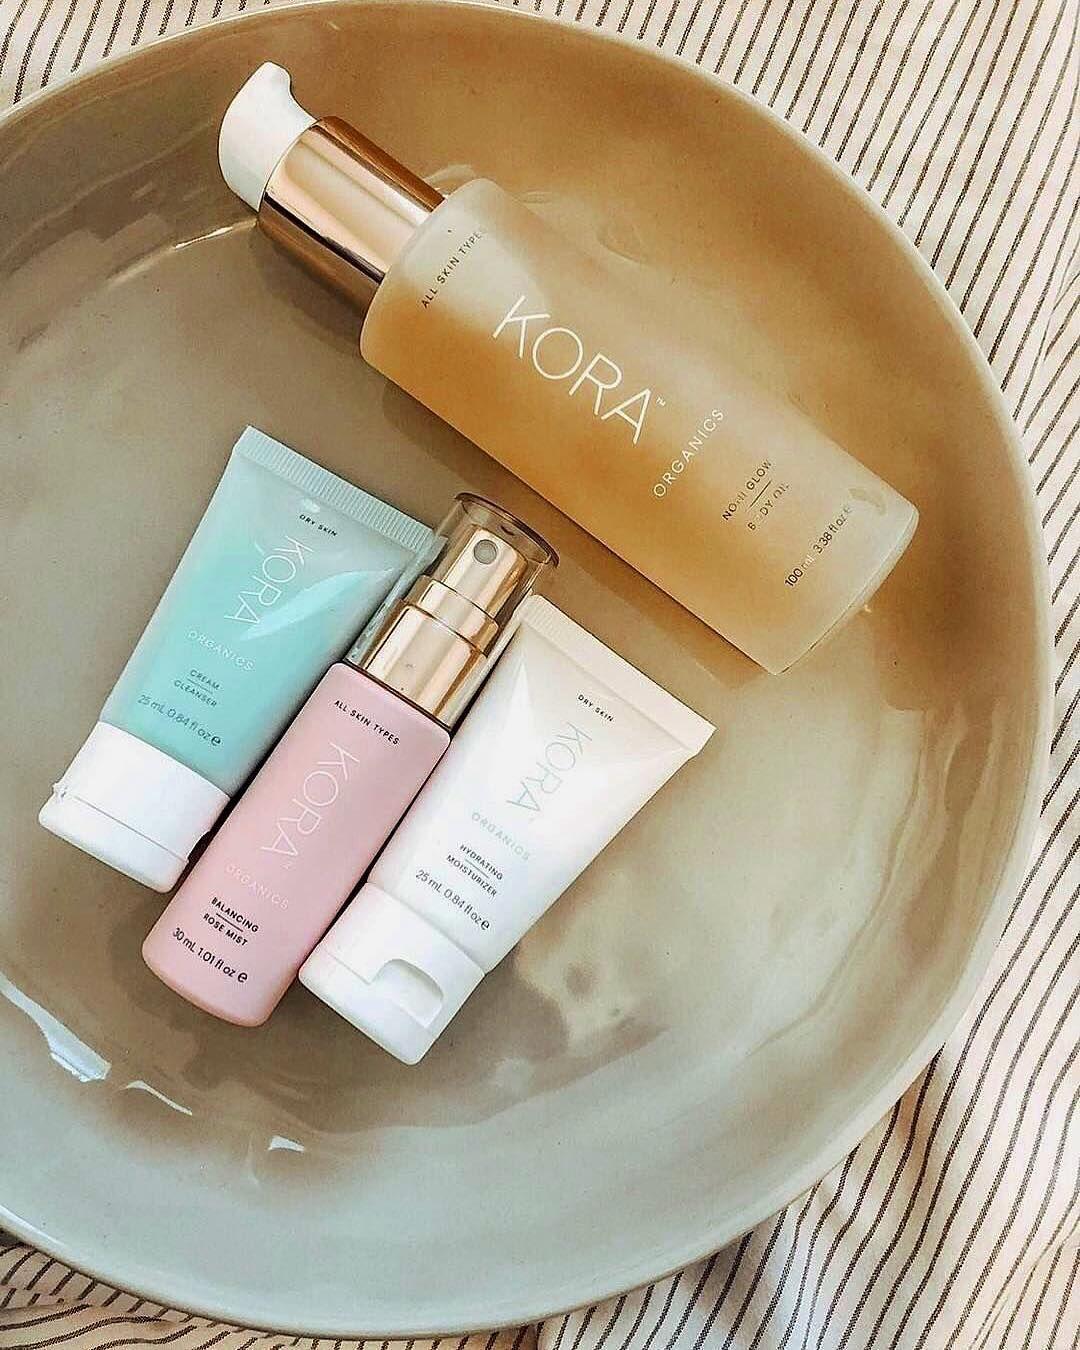 Kora Organics body oil, balancing rose mist, cream